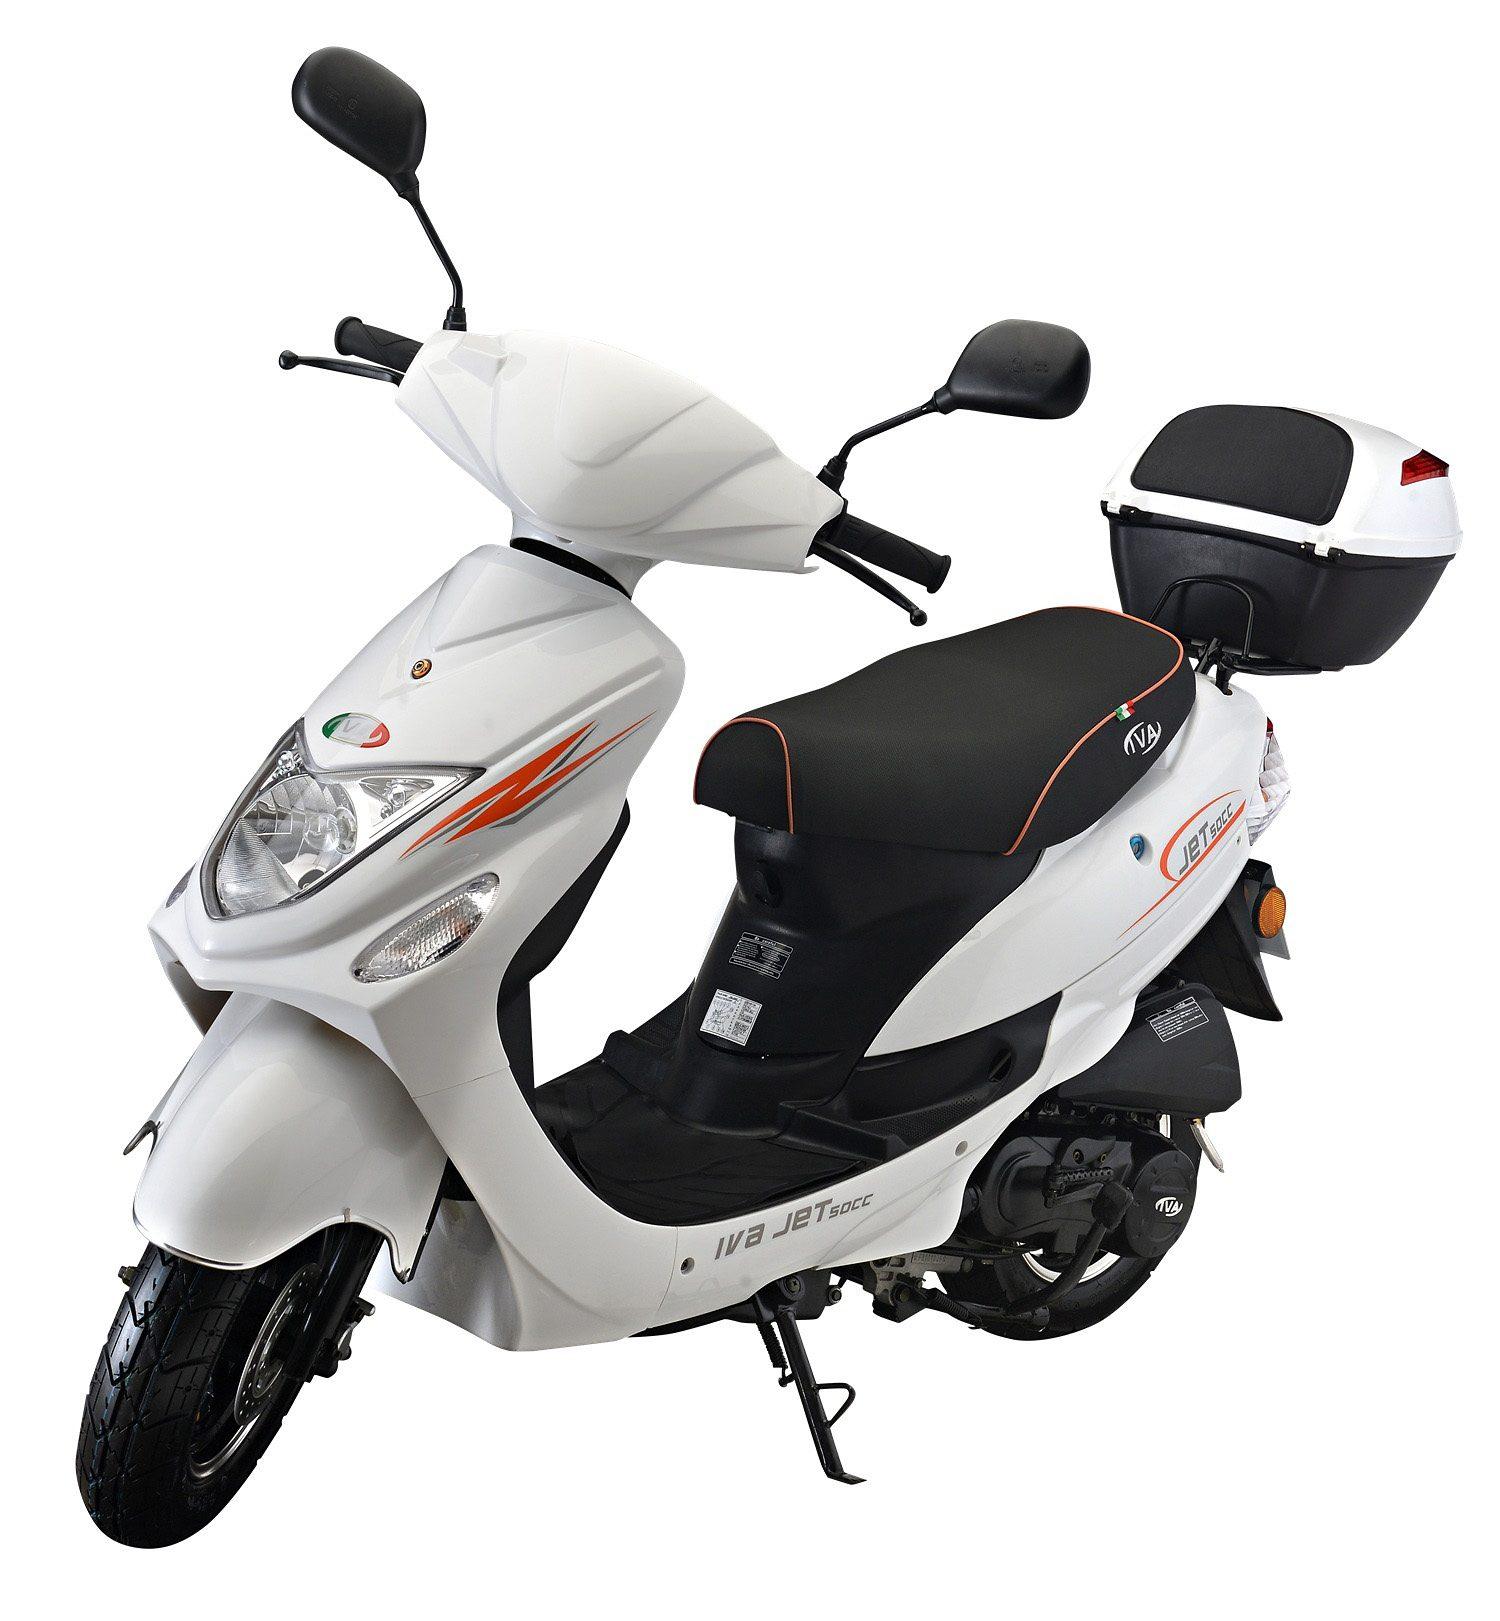 IVA Mofaroller inkl. Topcase, 49 ccm, 25 km/h, weiß, »Jet New«